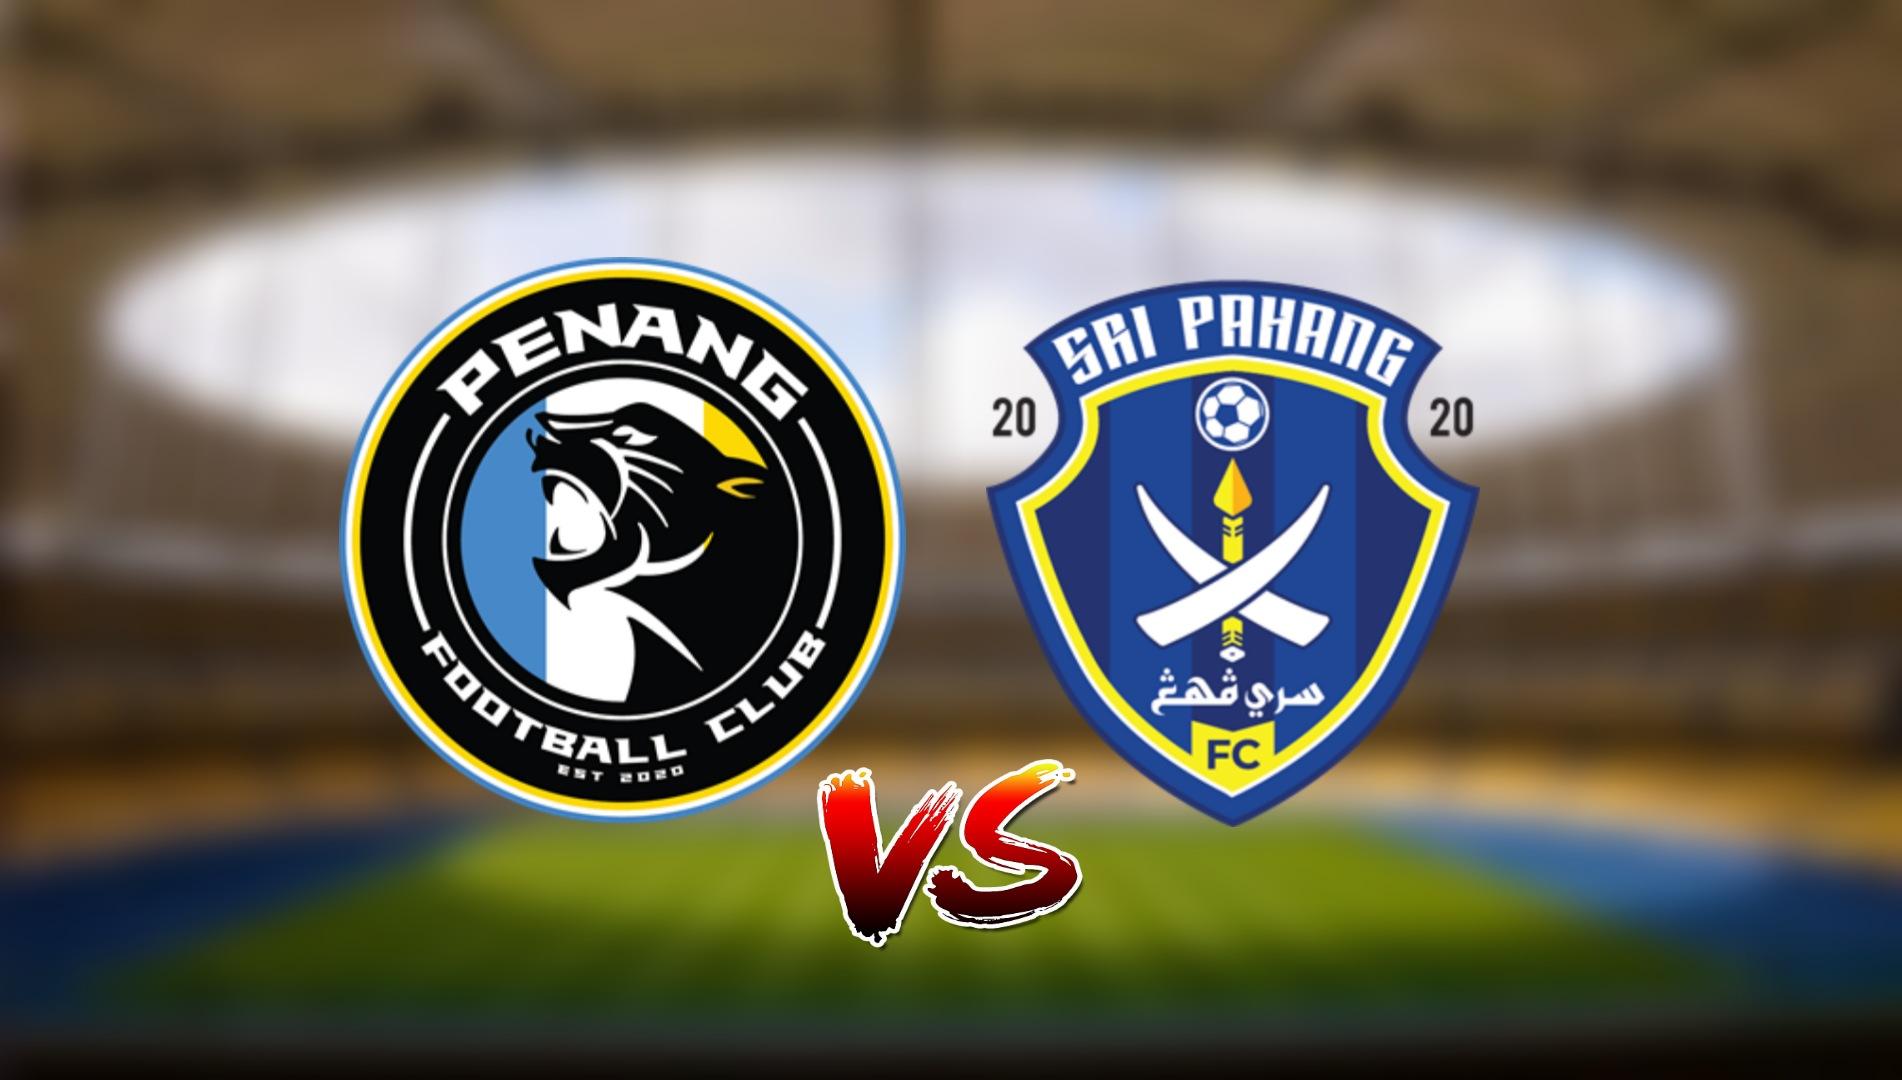 Live Streaming Penang FC vs Sri Pahang FC Liga Super 24.4.2021